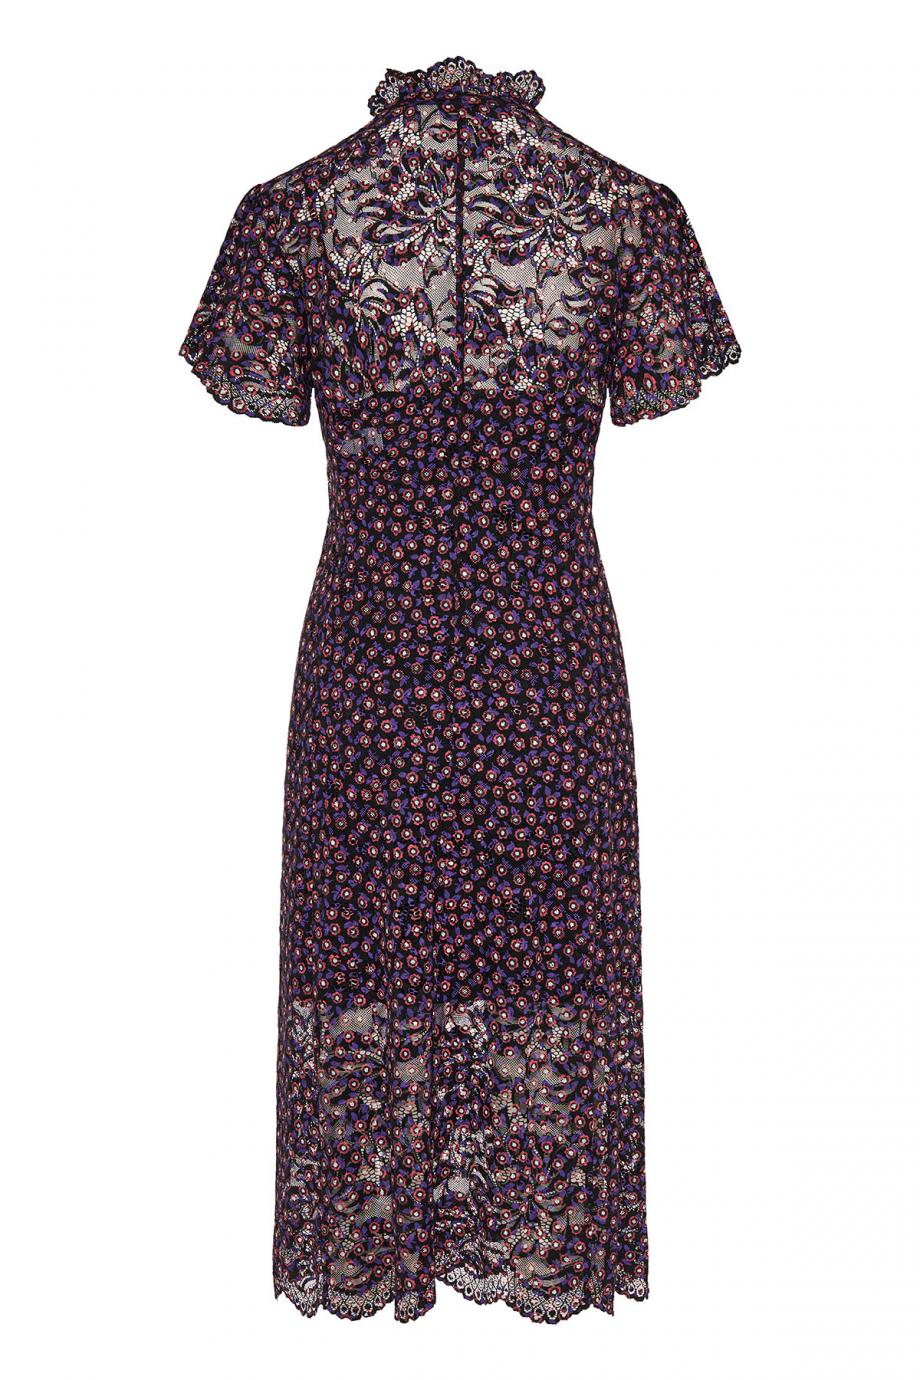 Printed lace midi dress